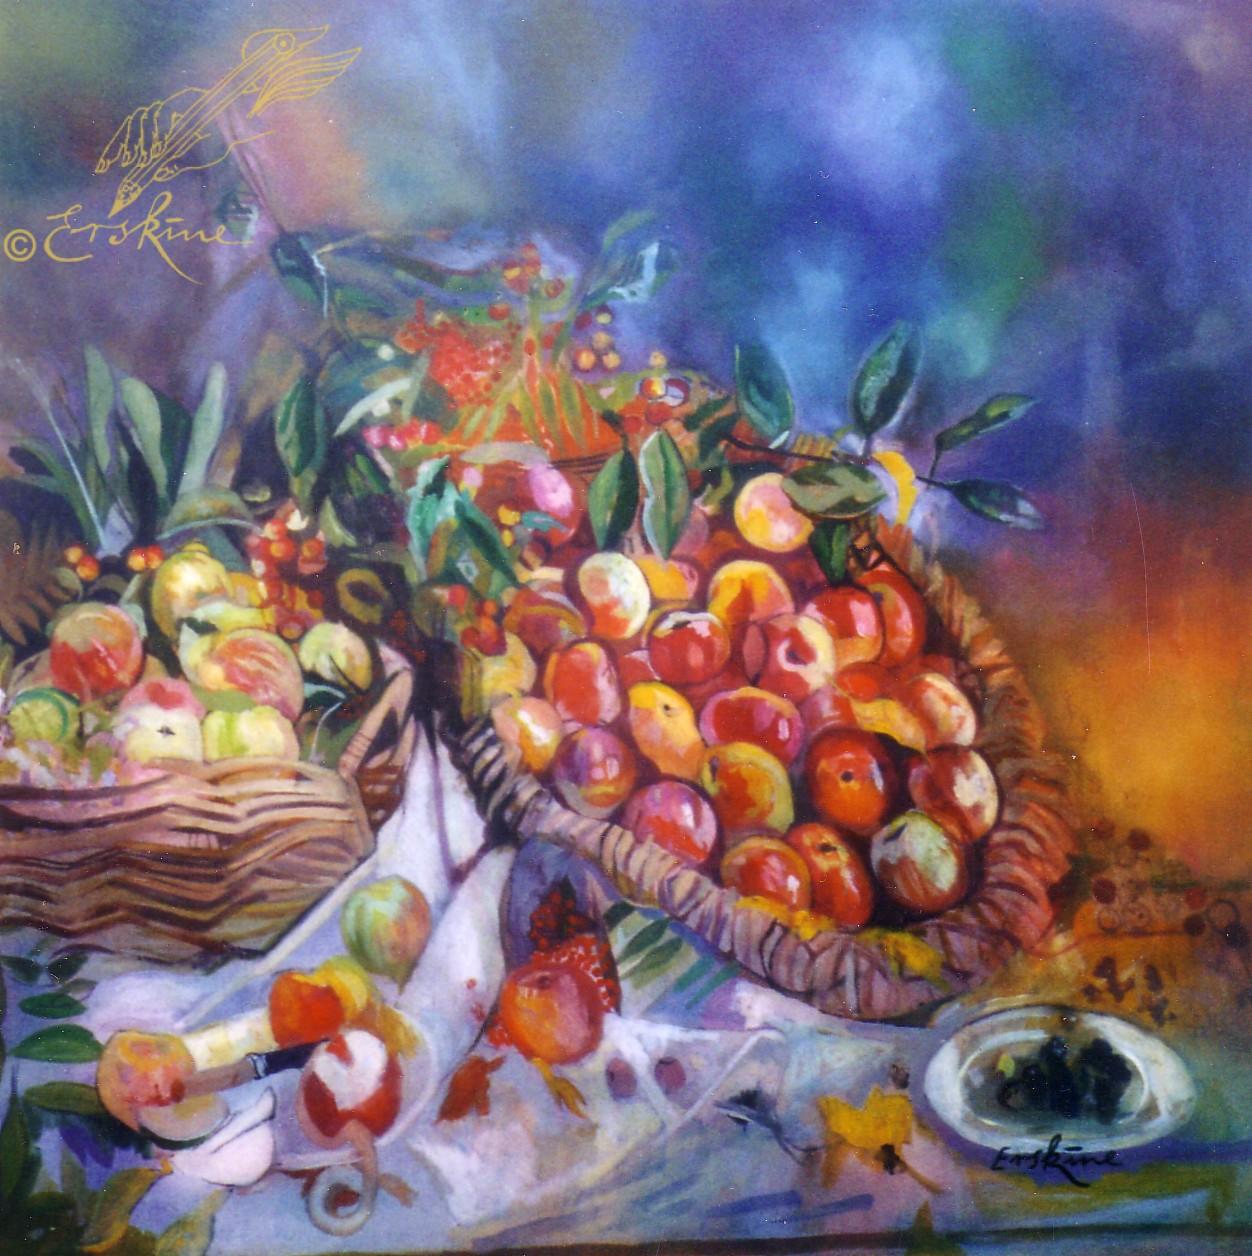 Still life, oil on canvas, 1.4x1.4